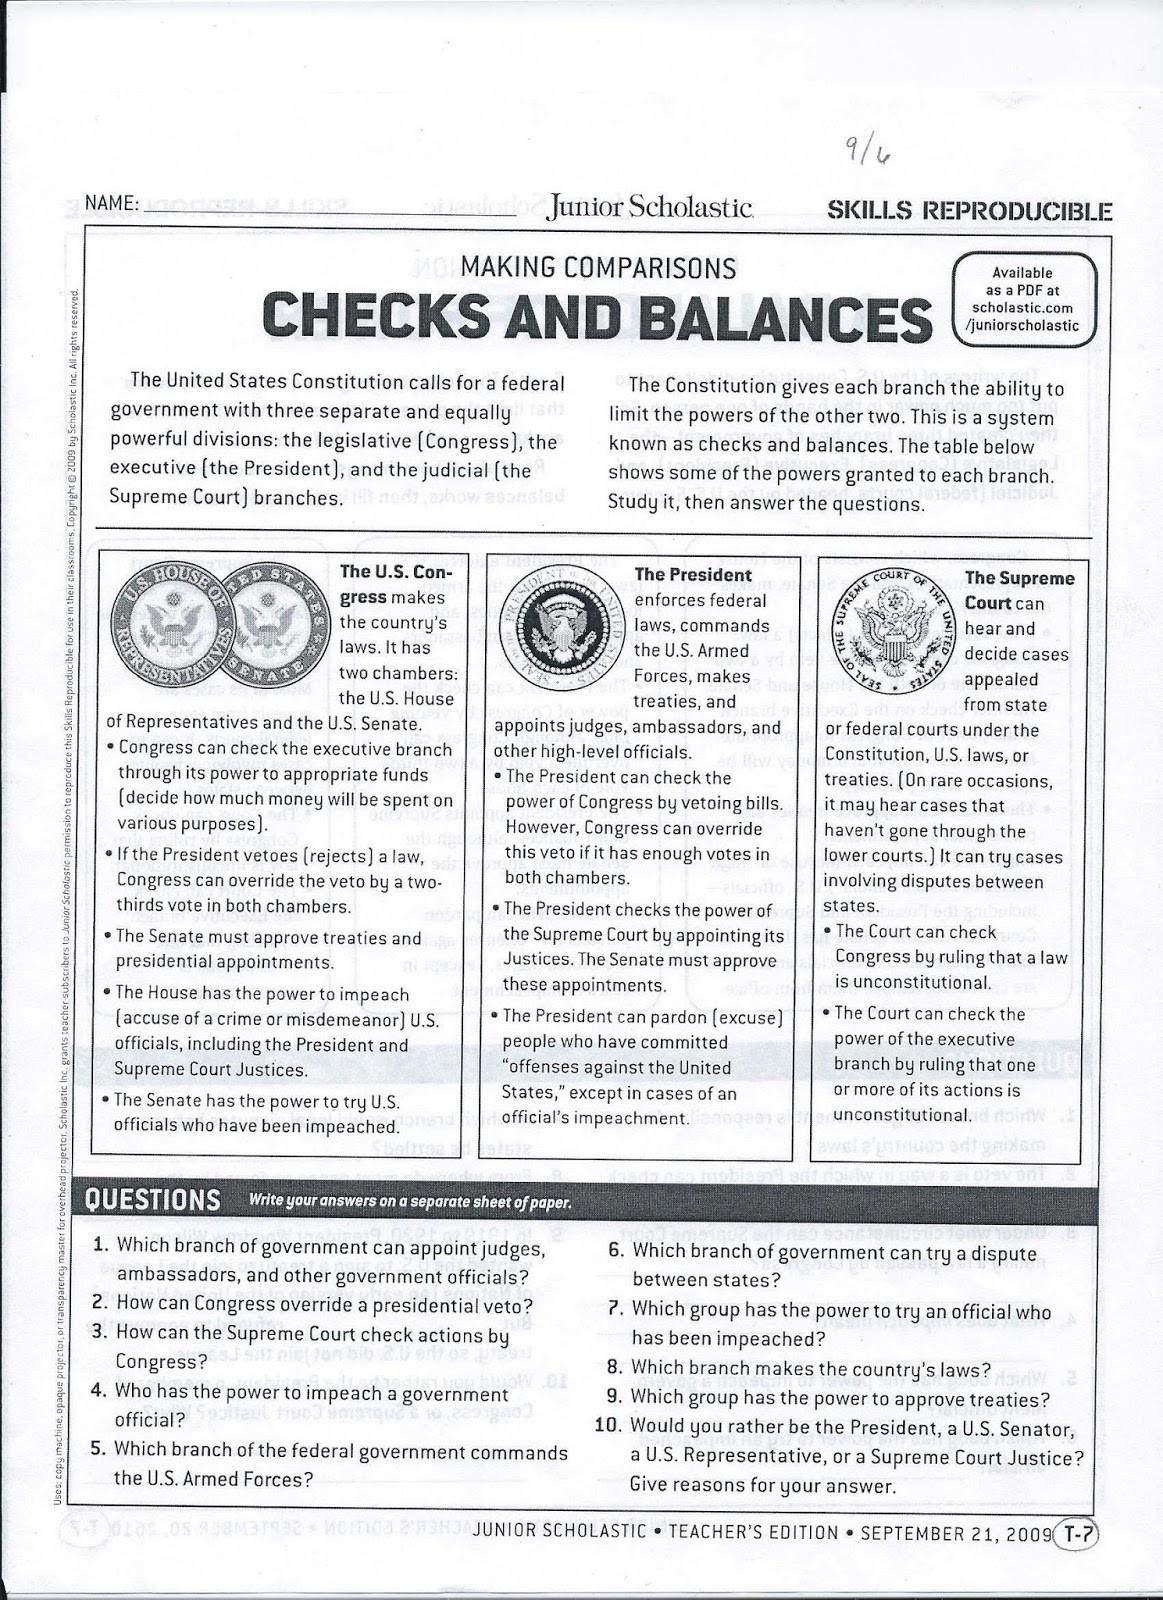 Checks and Balances Worksheet Answers Gms 6th Grade social Stu S Checks and Balances